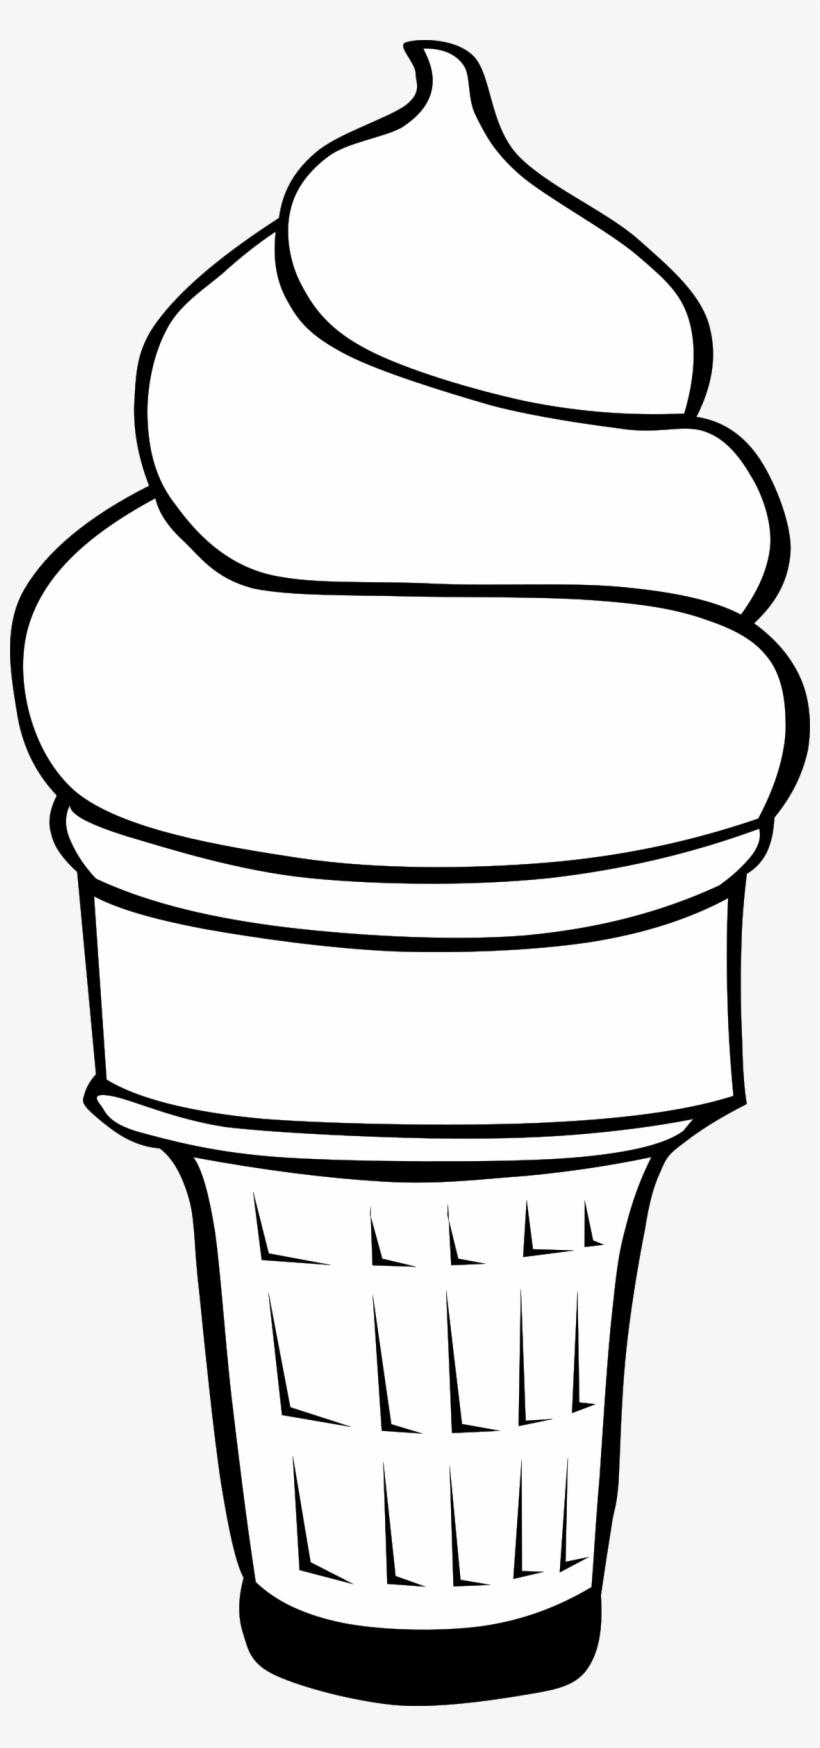 Free black and white ice cream clipart svg stock Ice Clipart Line - Cute Black And White Ice Cream Cones Clipart ... svg stock